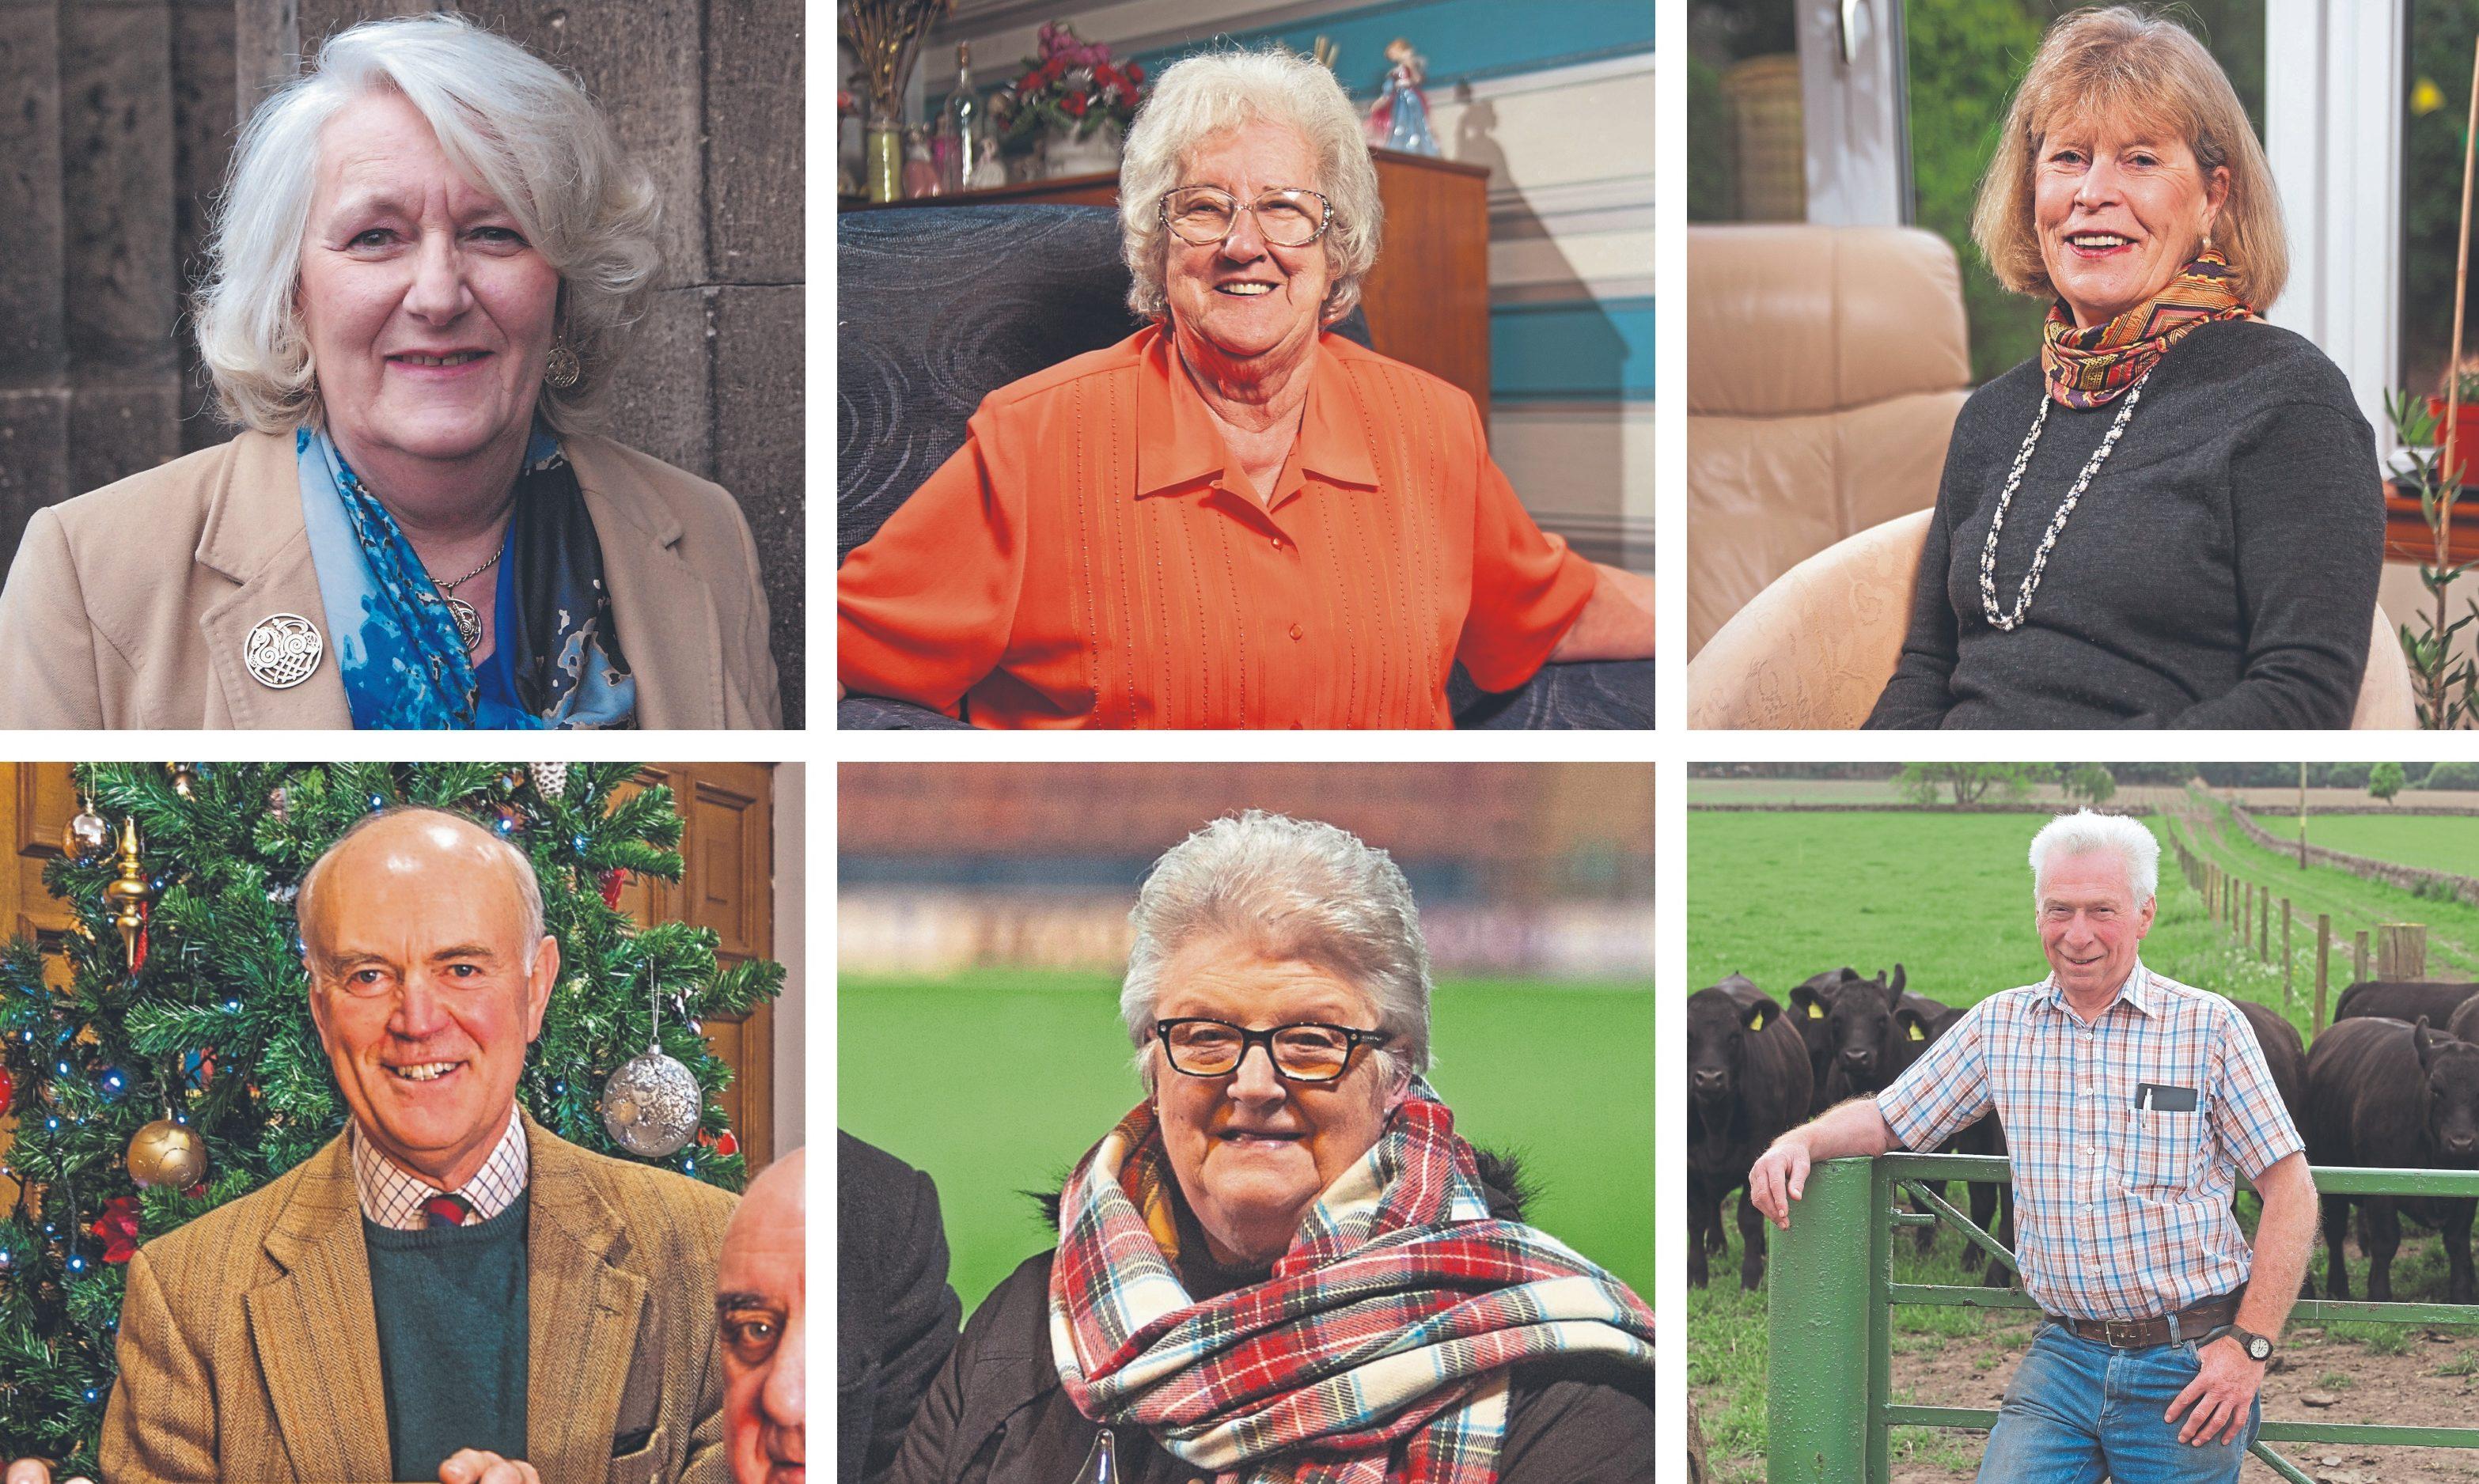 Top (L-R): Irene McGrath, Amy Mathewson and Jo Middlemiss.  Bottom (L-R): Roderick Riddel, Marvyn Stewart and Geordie Soutar.